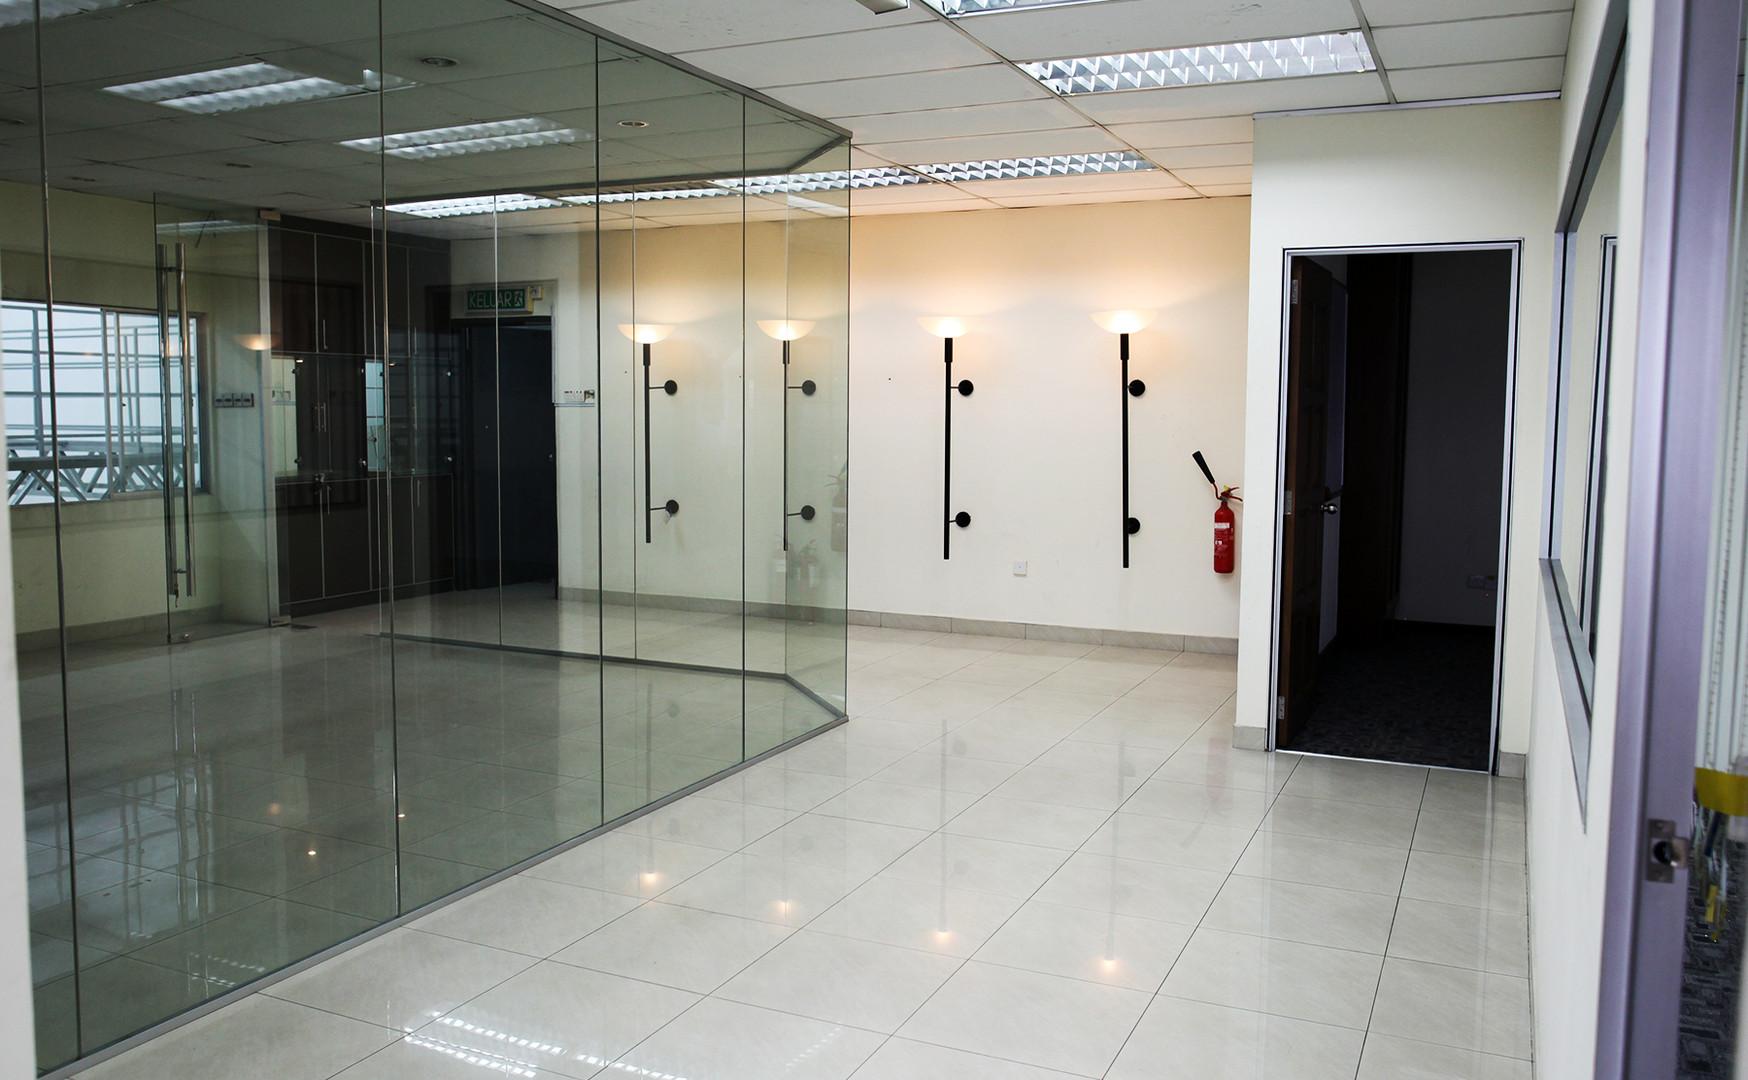 1F - Corridor